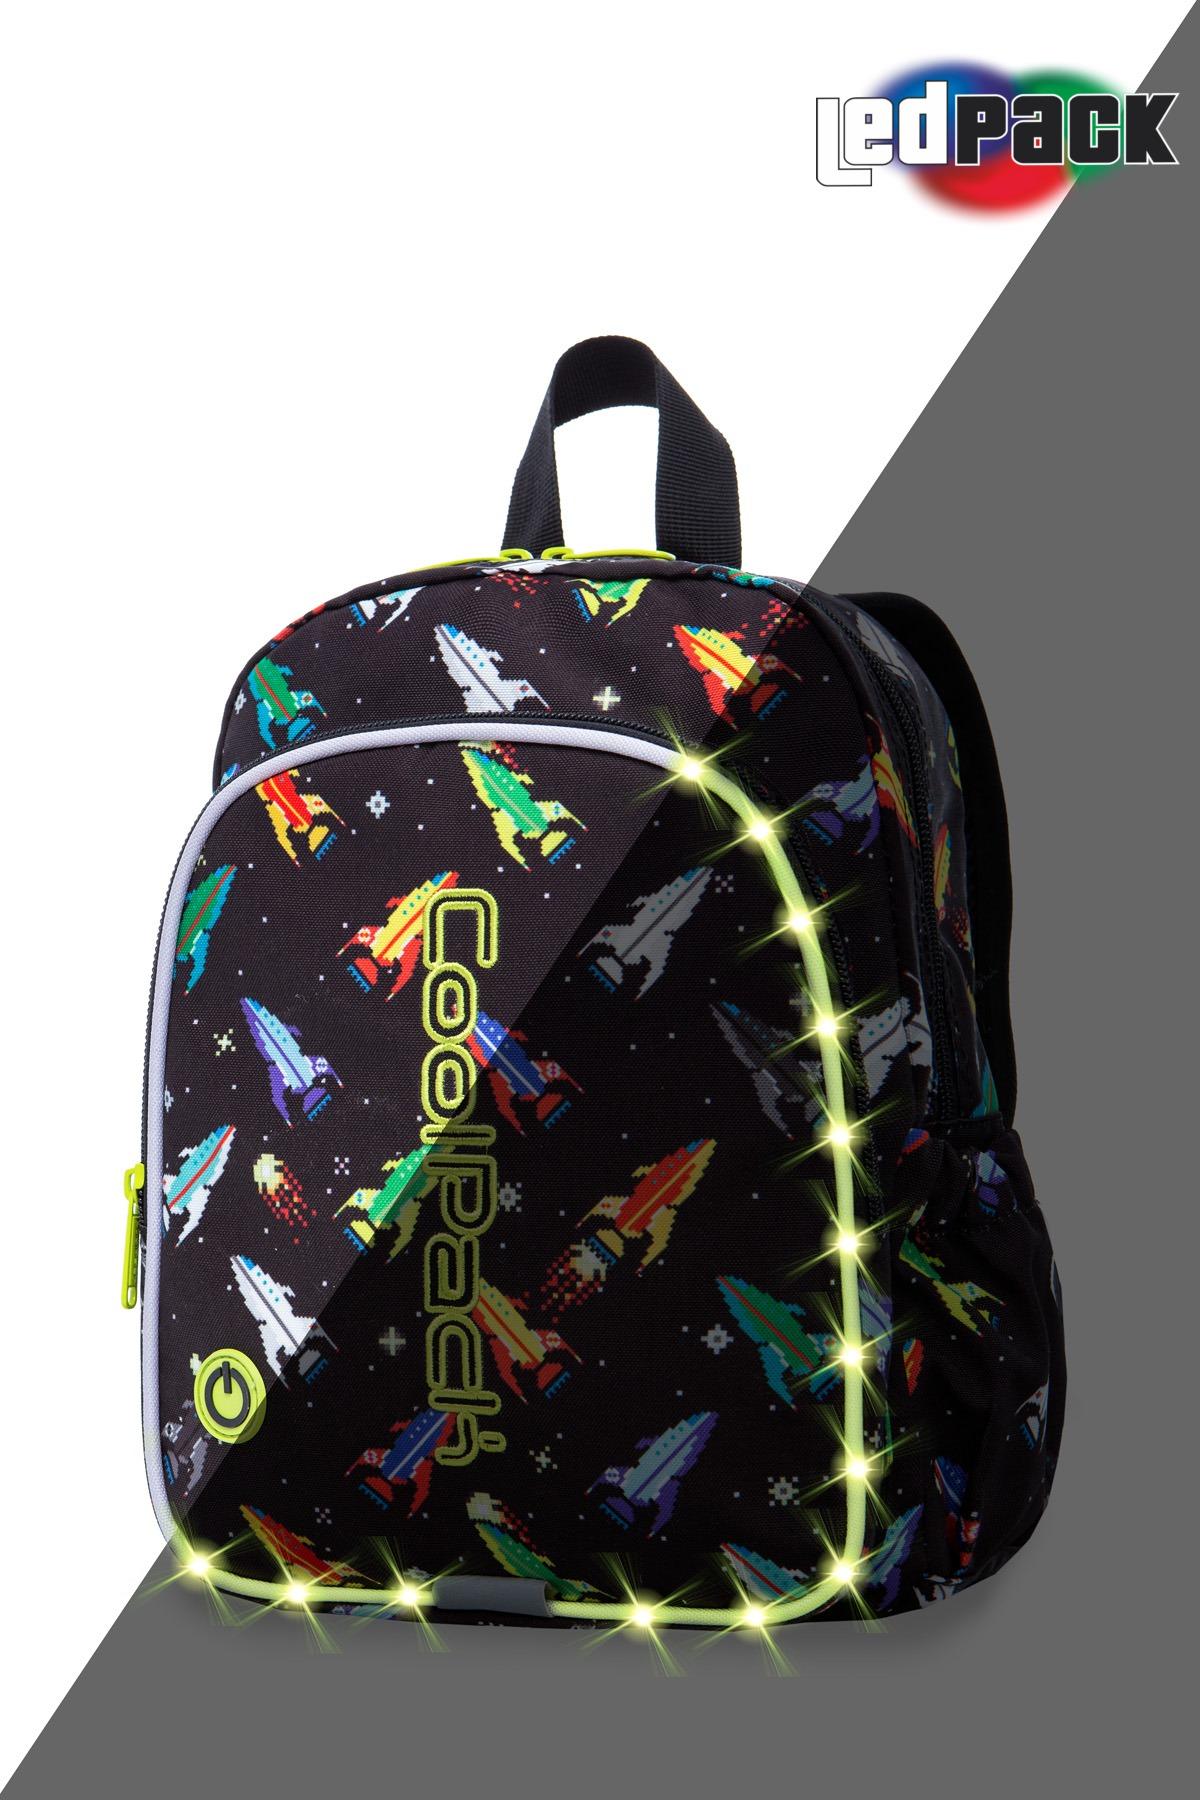 Coolpack - bobby - kids backpack - led rockets